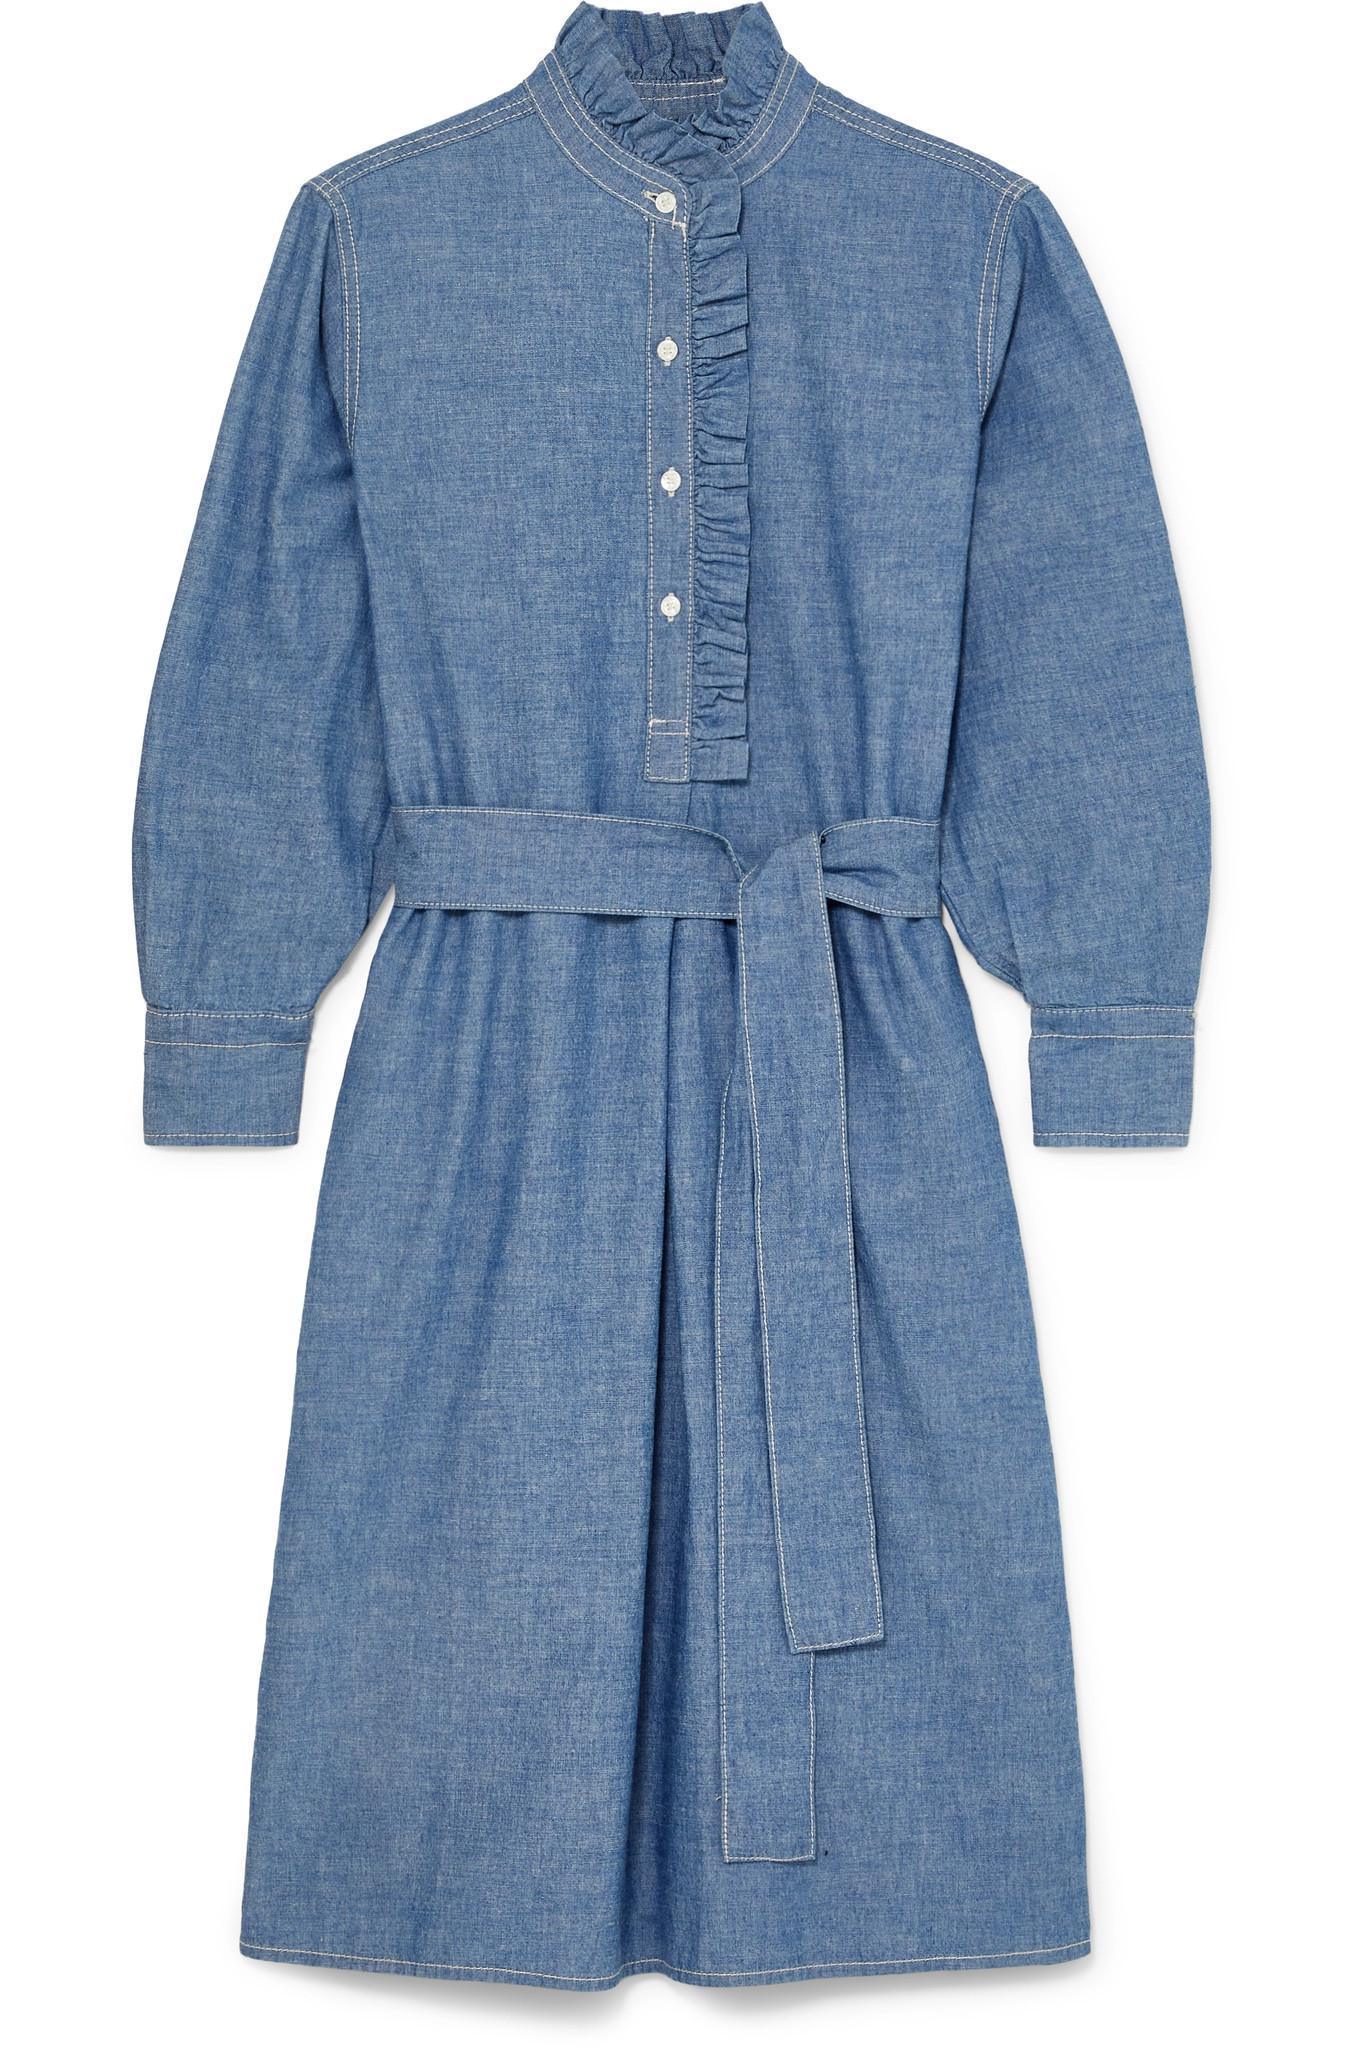 dd032b7f2c Tory Burch. Women s Blue Deneuve Belted Ruffle-trimmed Cotton-chambray Dress